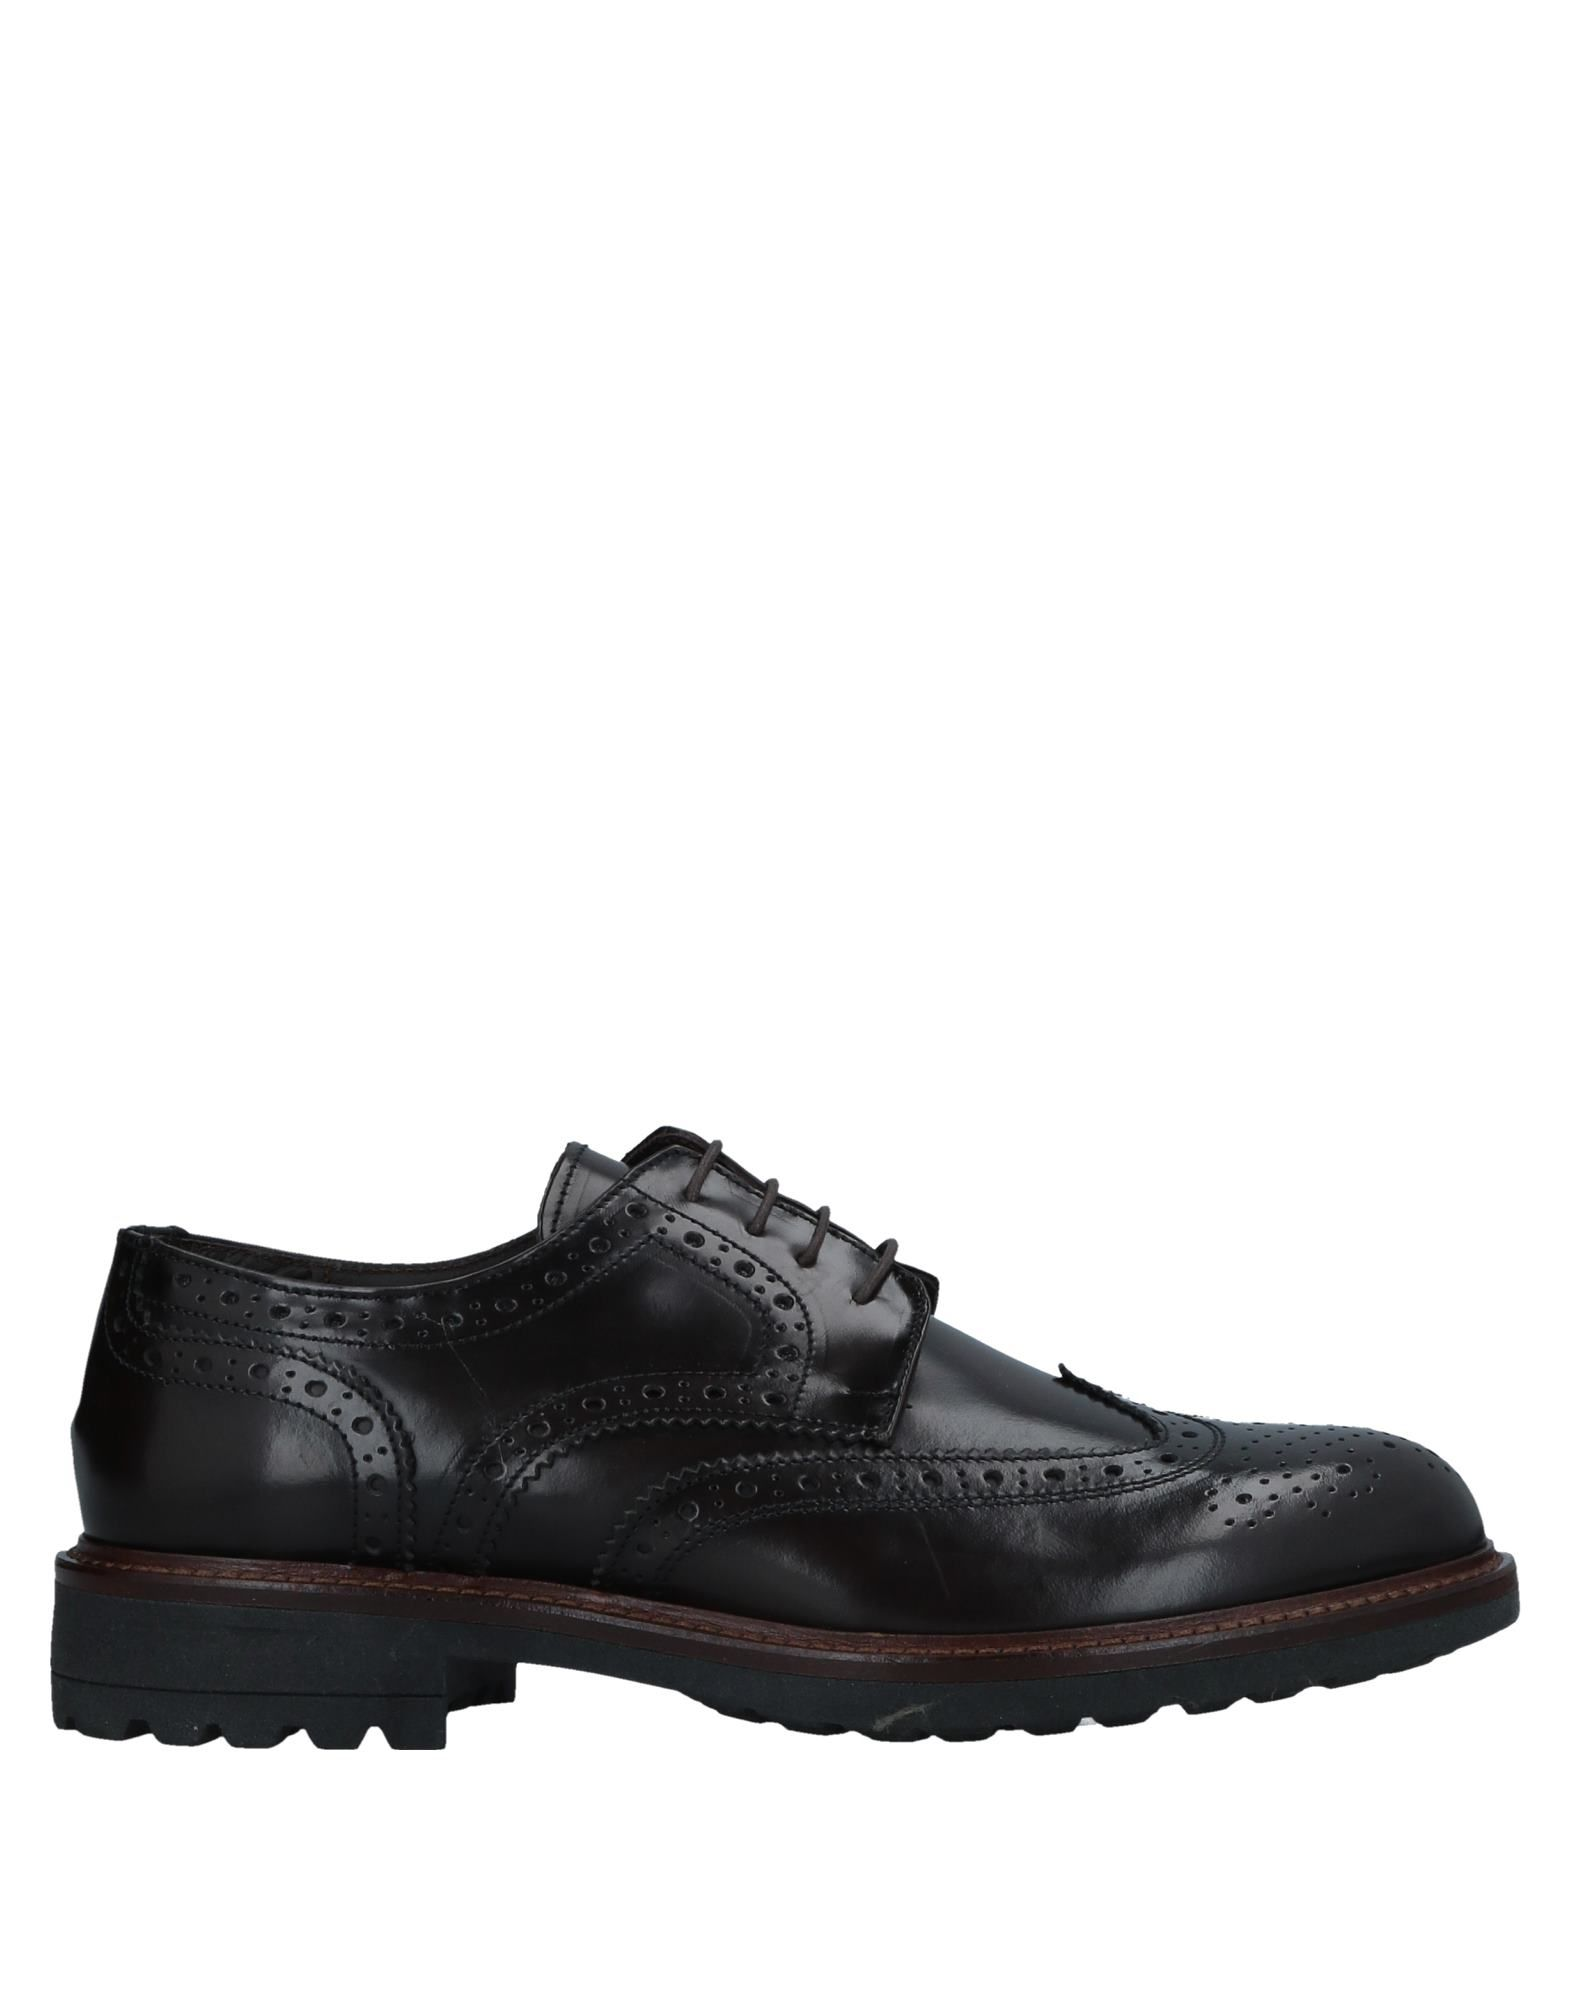 Rabatt echte Schuhe Brawn's Schnürschuhe Herren  11529952AT